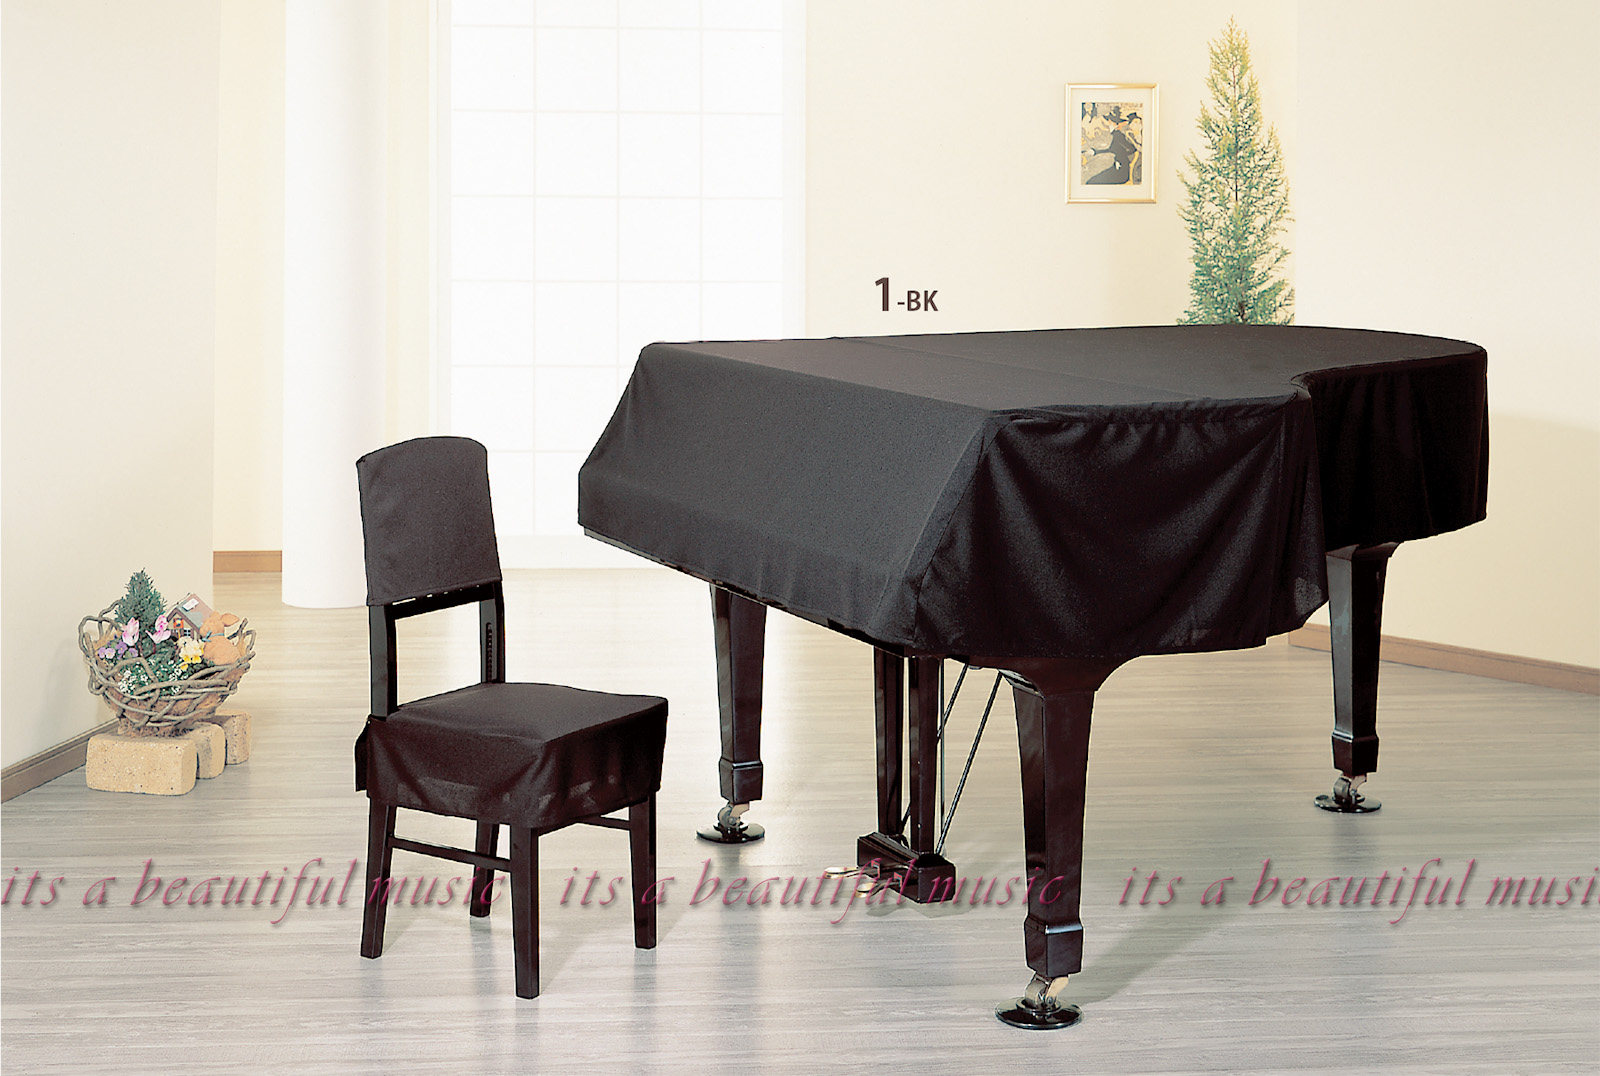 【its】レビューでもれなく高級クロス同梱!グランドピアノカバー アルプスG-UX-BK「シンプルなニット無地」【奥行150~160cm未満/A1/GB1K/GM12/G-156等】(アルプスUX-BKシリーズ)